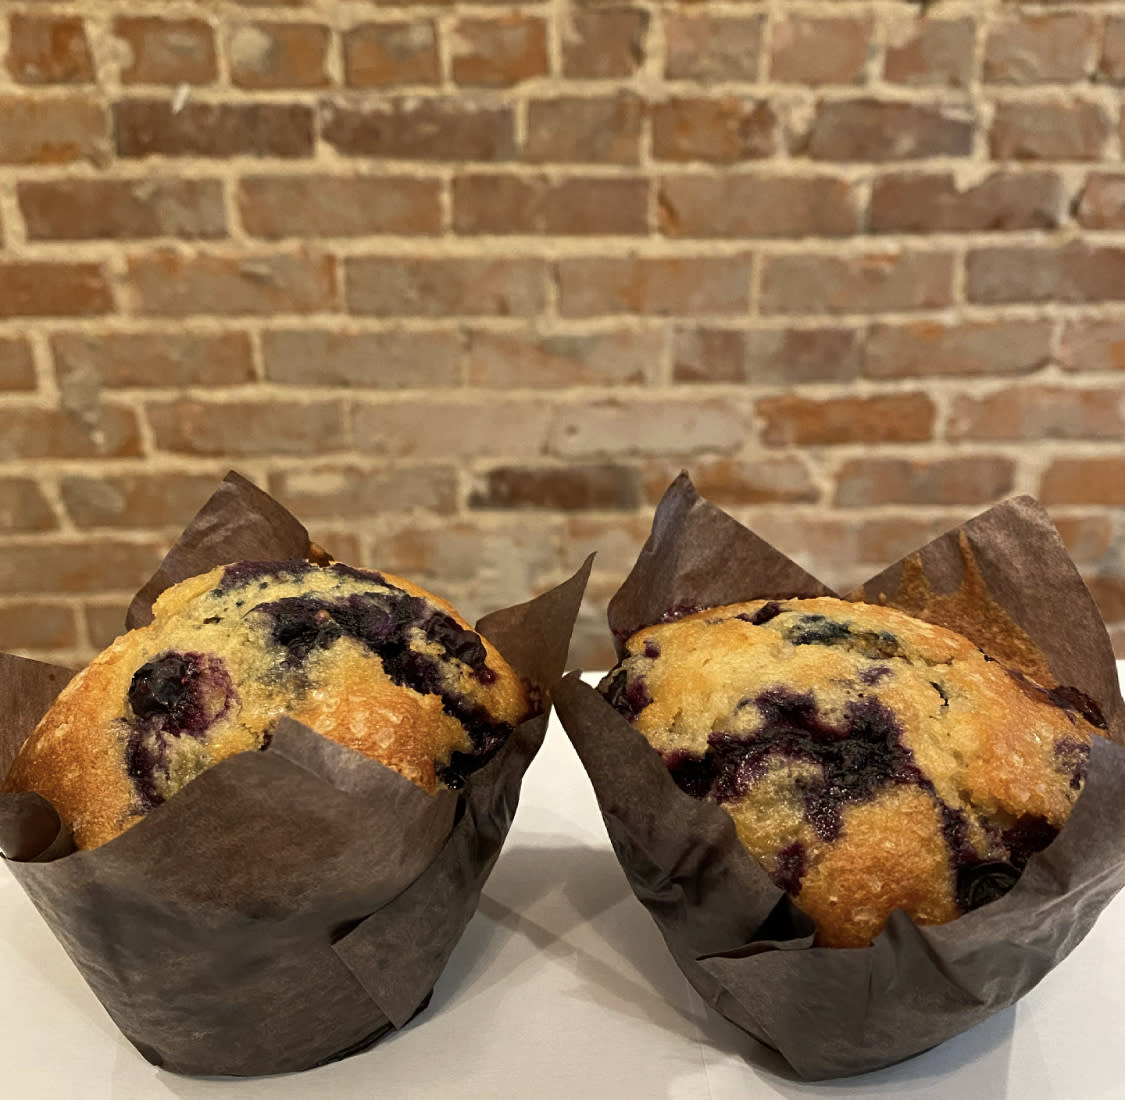 dogwood and magnolia bakery muffins